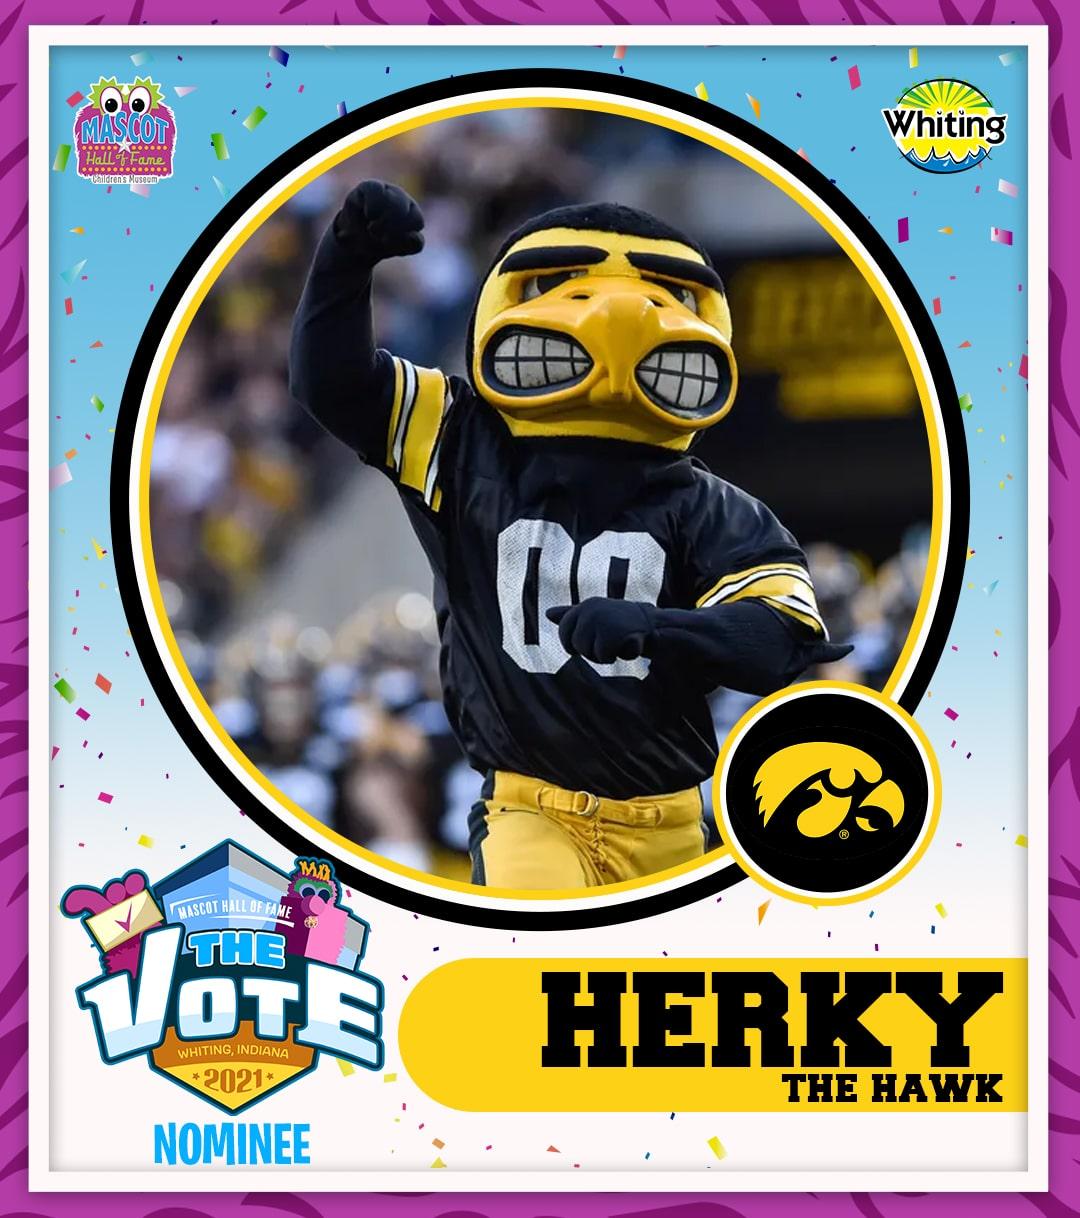 Herky the Hawk photo